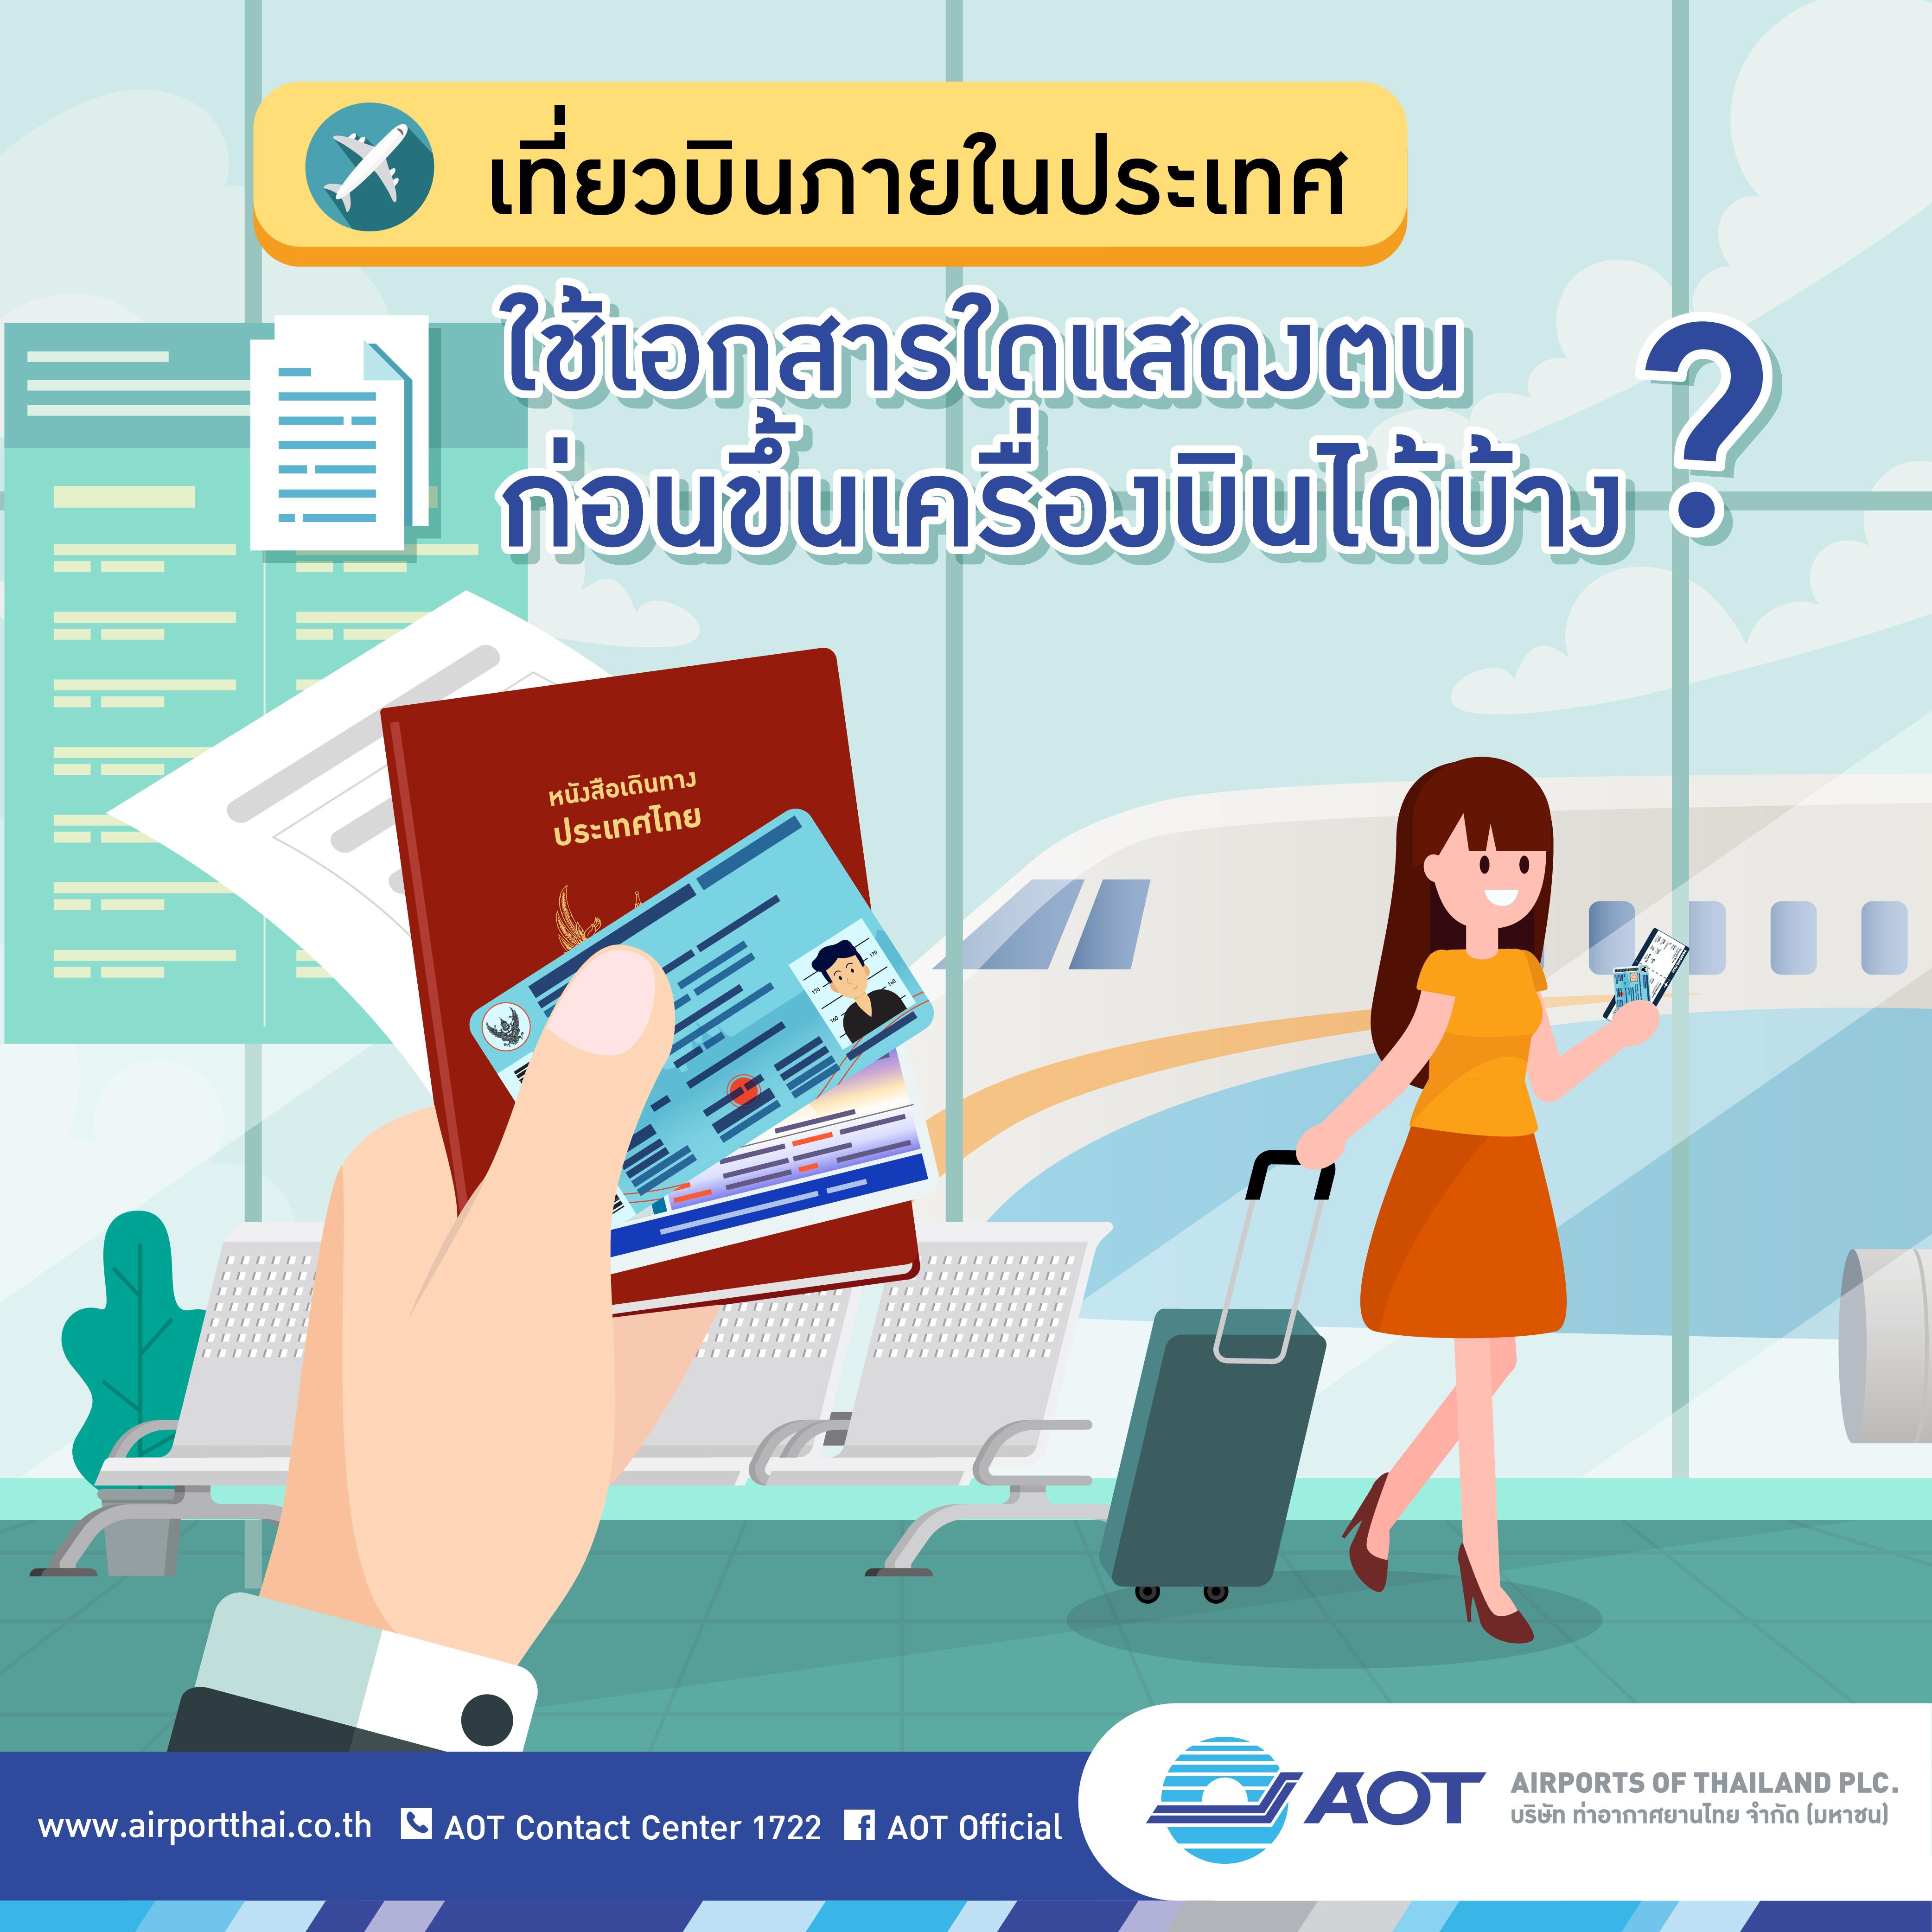 AOT_infographic18_การเตรียมเอกสารสำหรับเที่ยวบินภายในประเทศ_20190827_V5_page-01